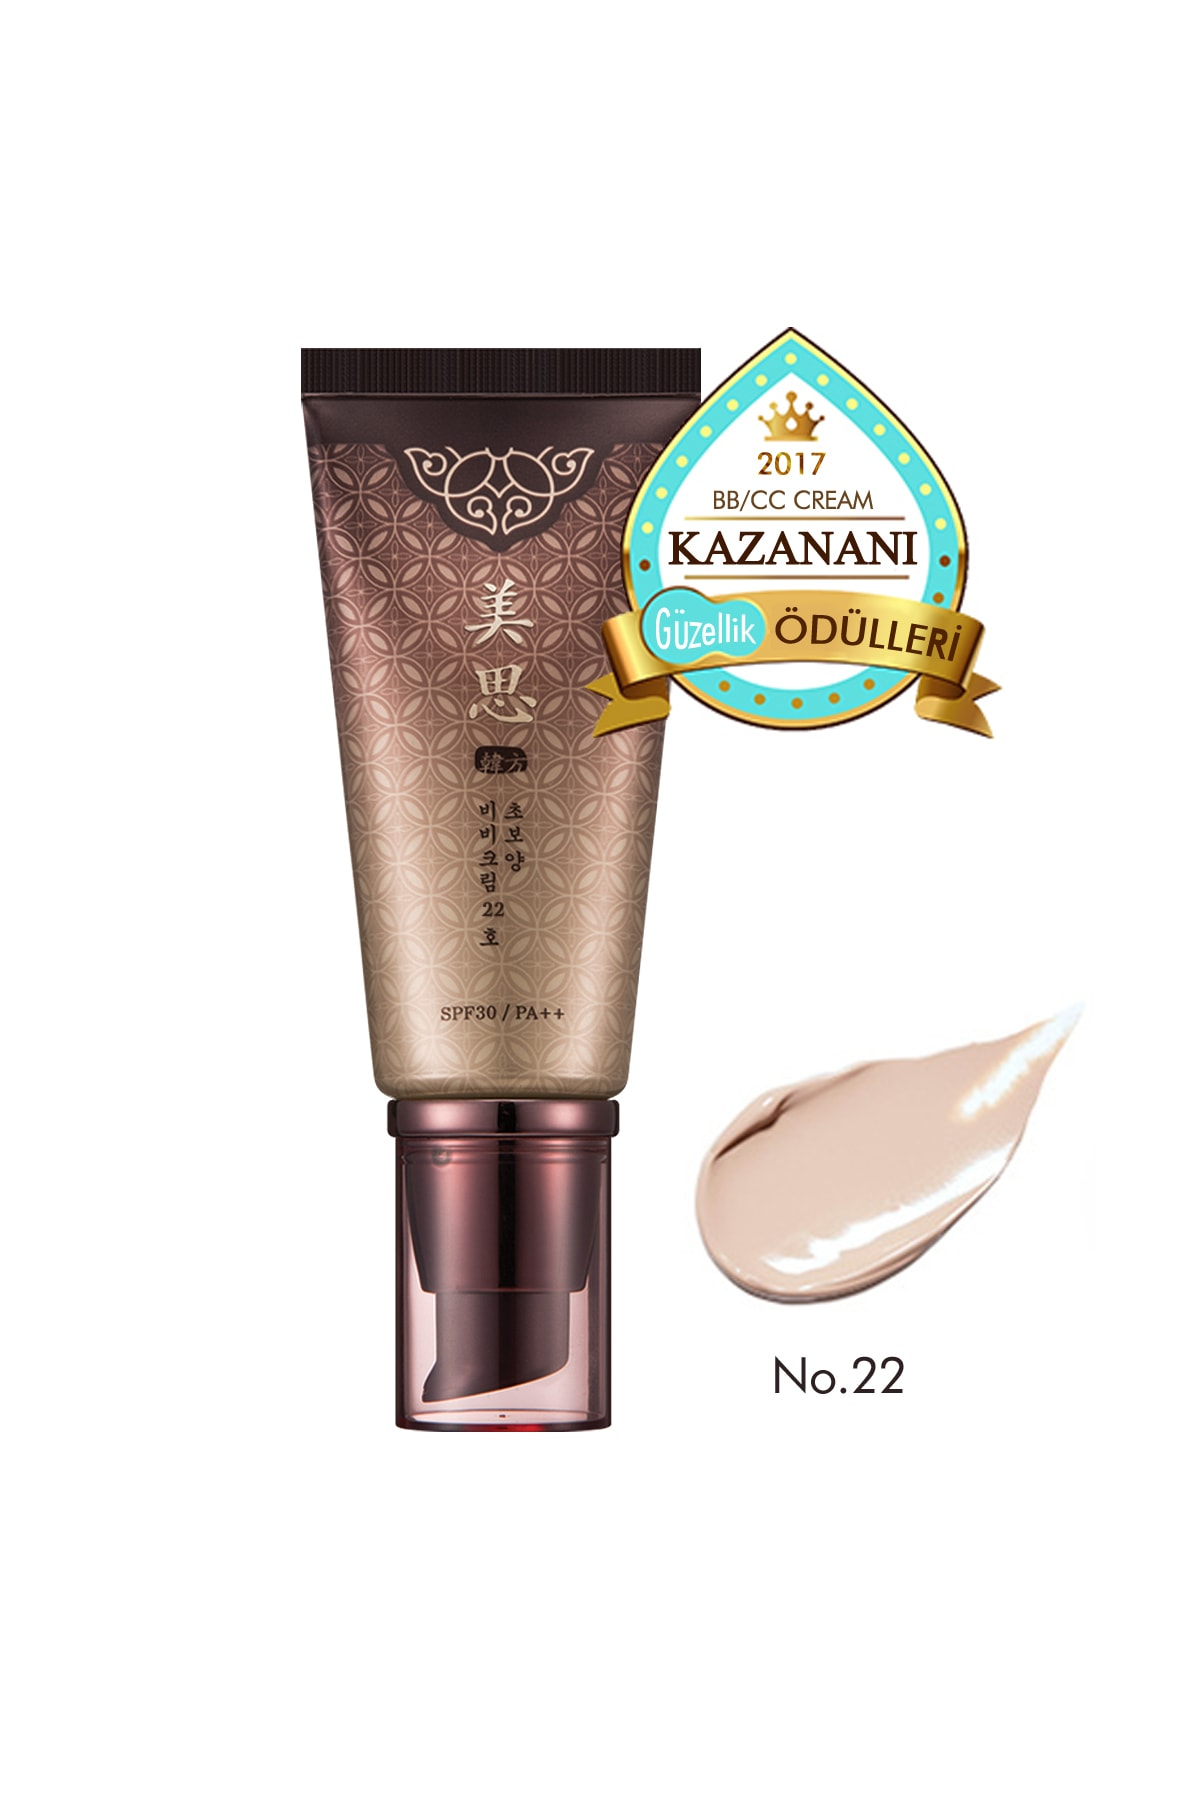 Missha Yoğun Kapatıcı Bitkisel BB Krem 50ml MISA Cho Bo Yang BB Cream SPF30/PA++ (No.22 ) 0